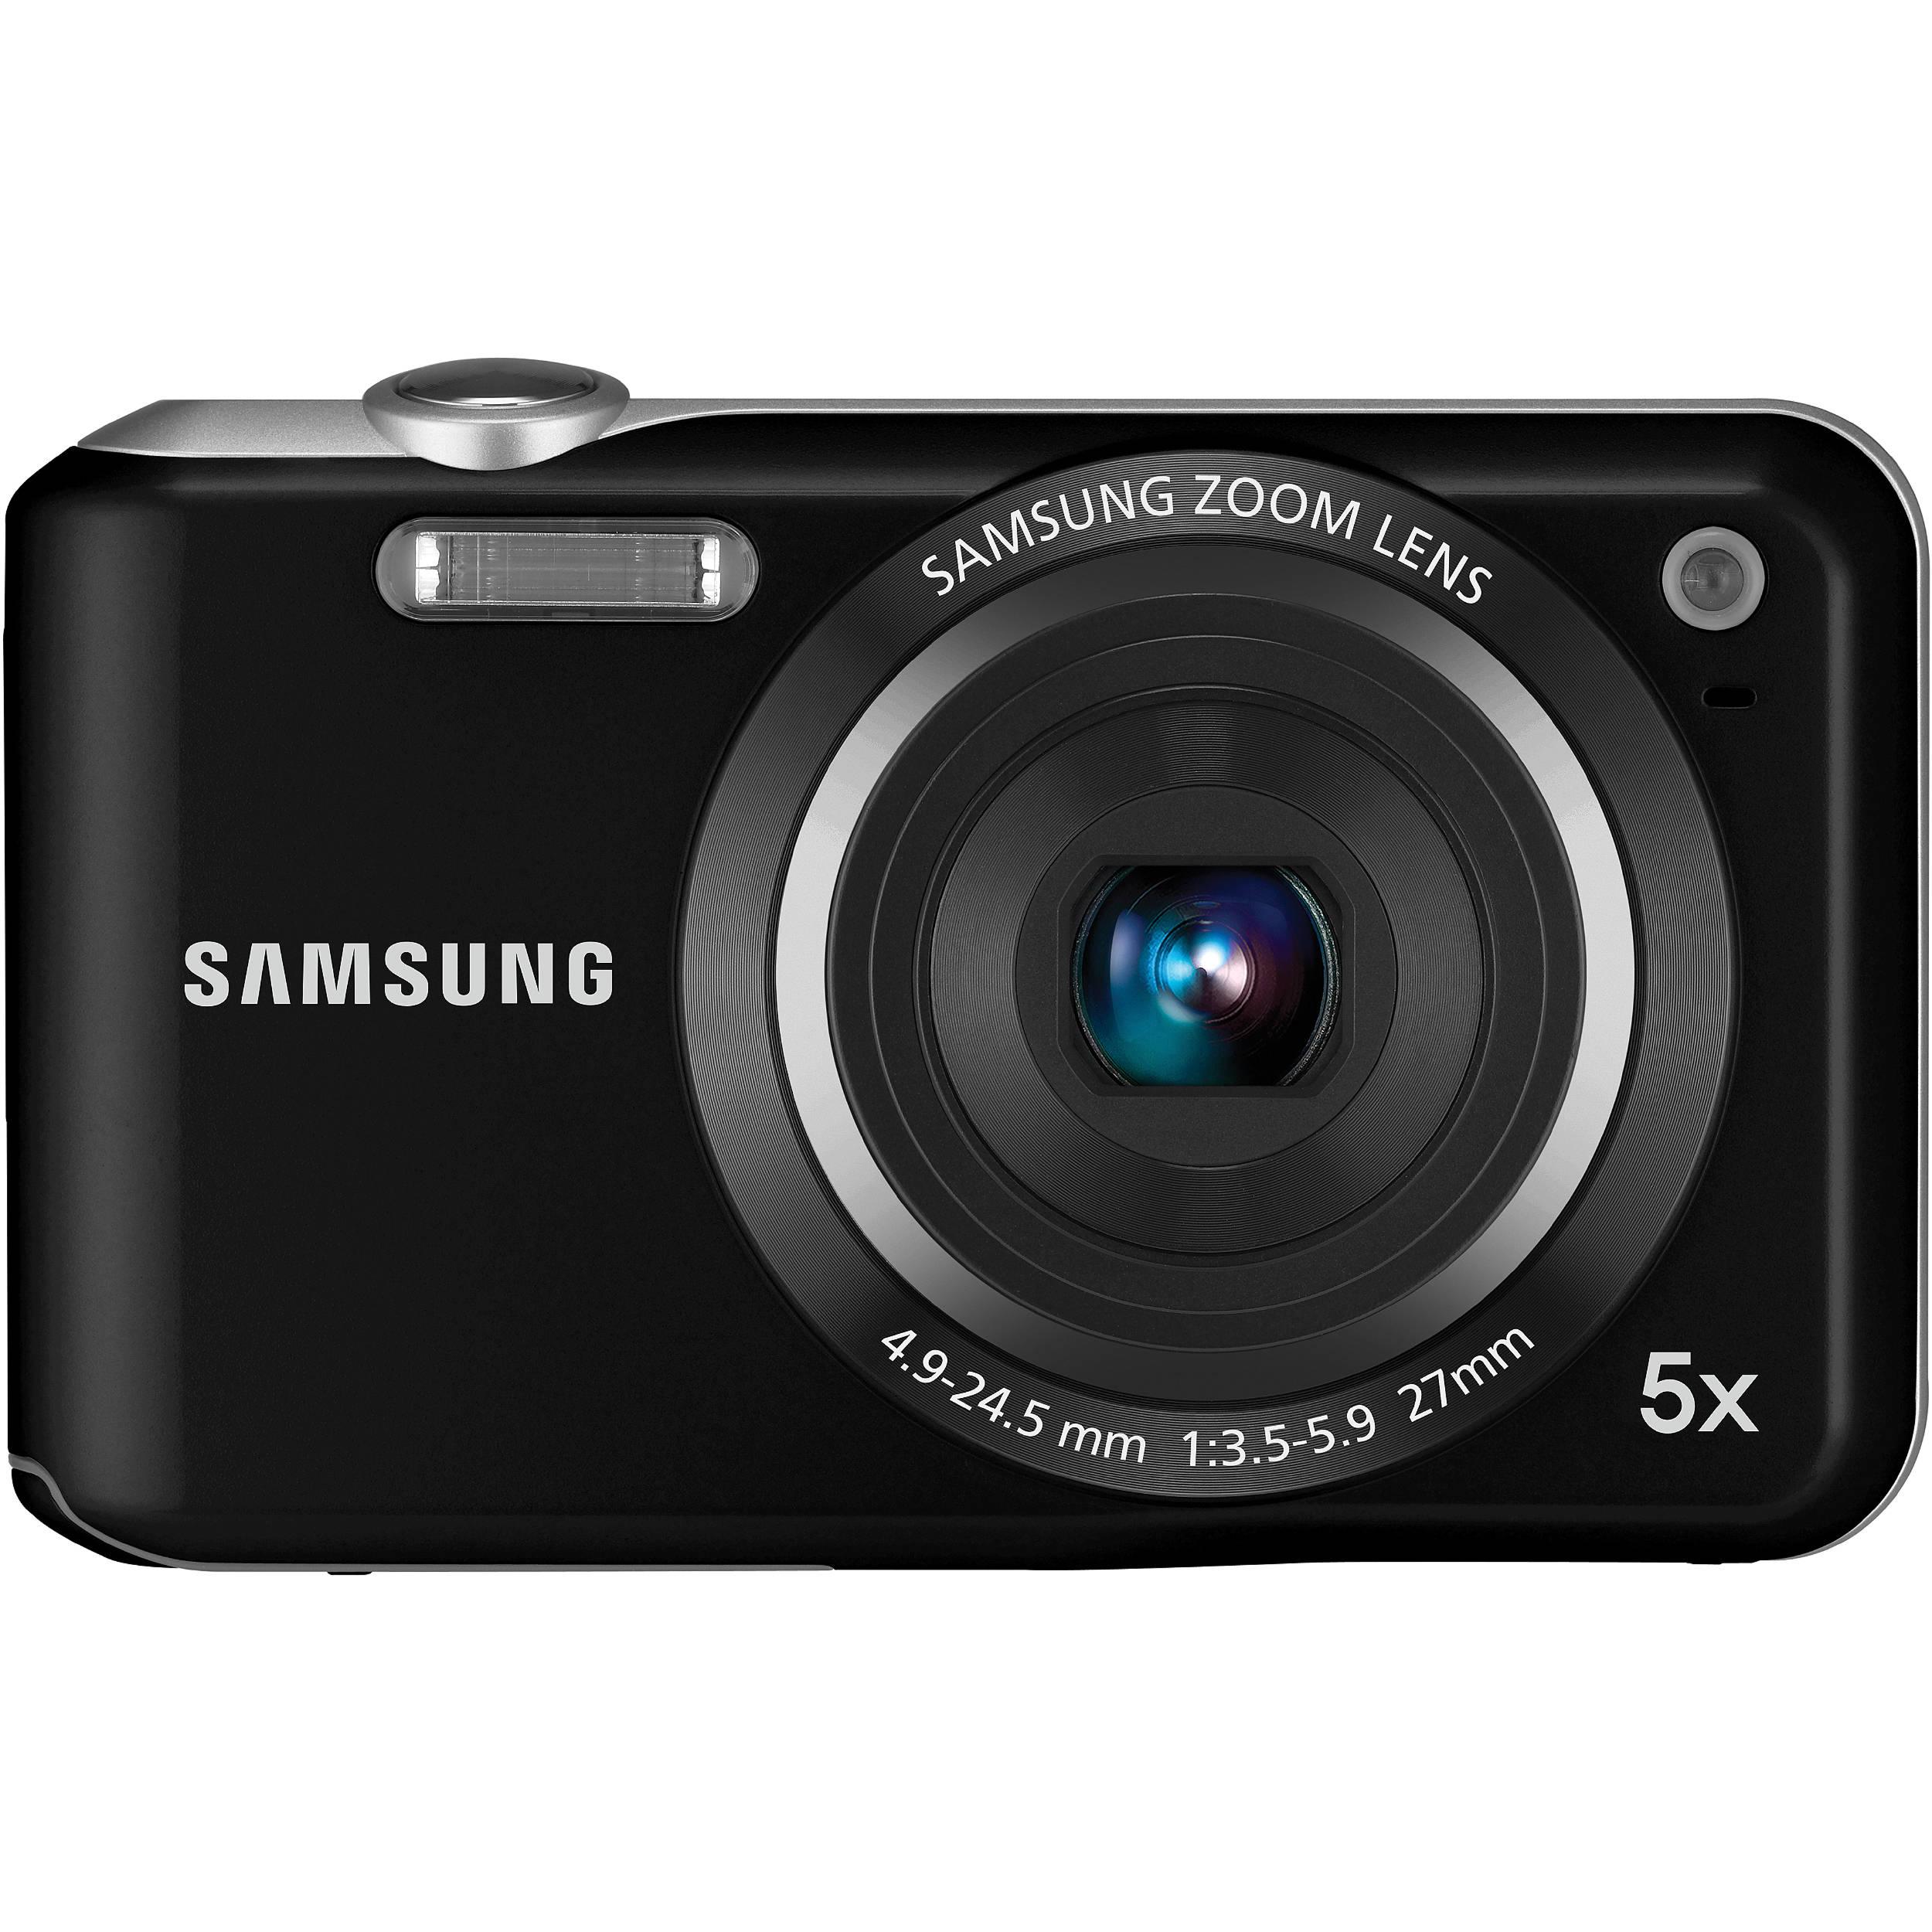 Samsung SL50 Digital Camera (Black) EC-SL50ZZBPBUS B&H Photo